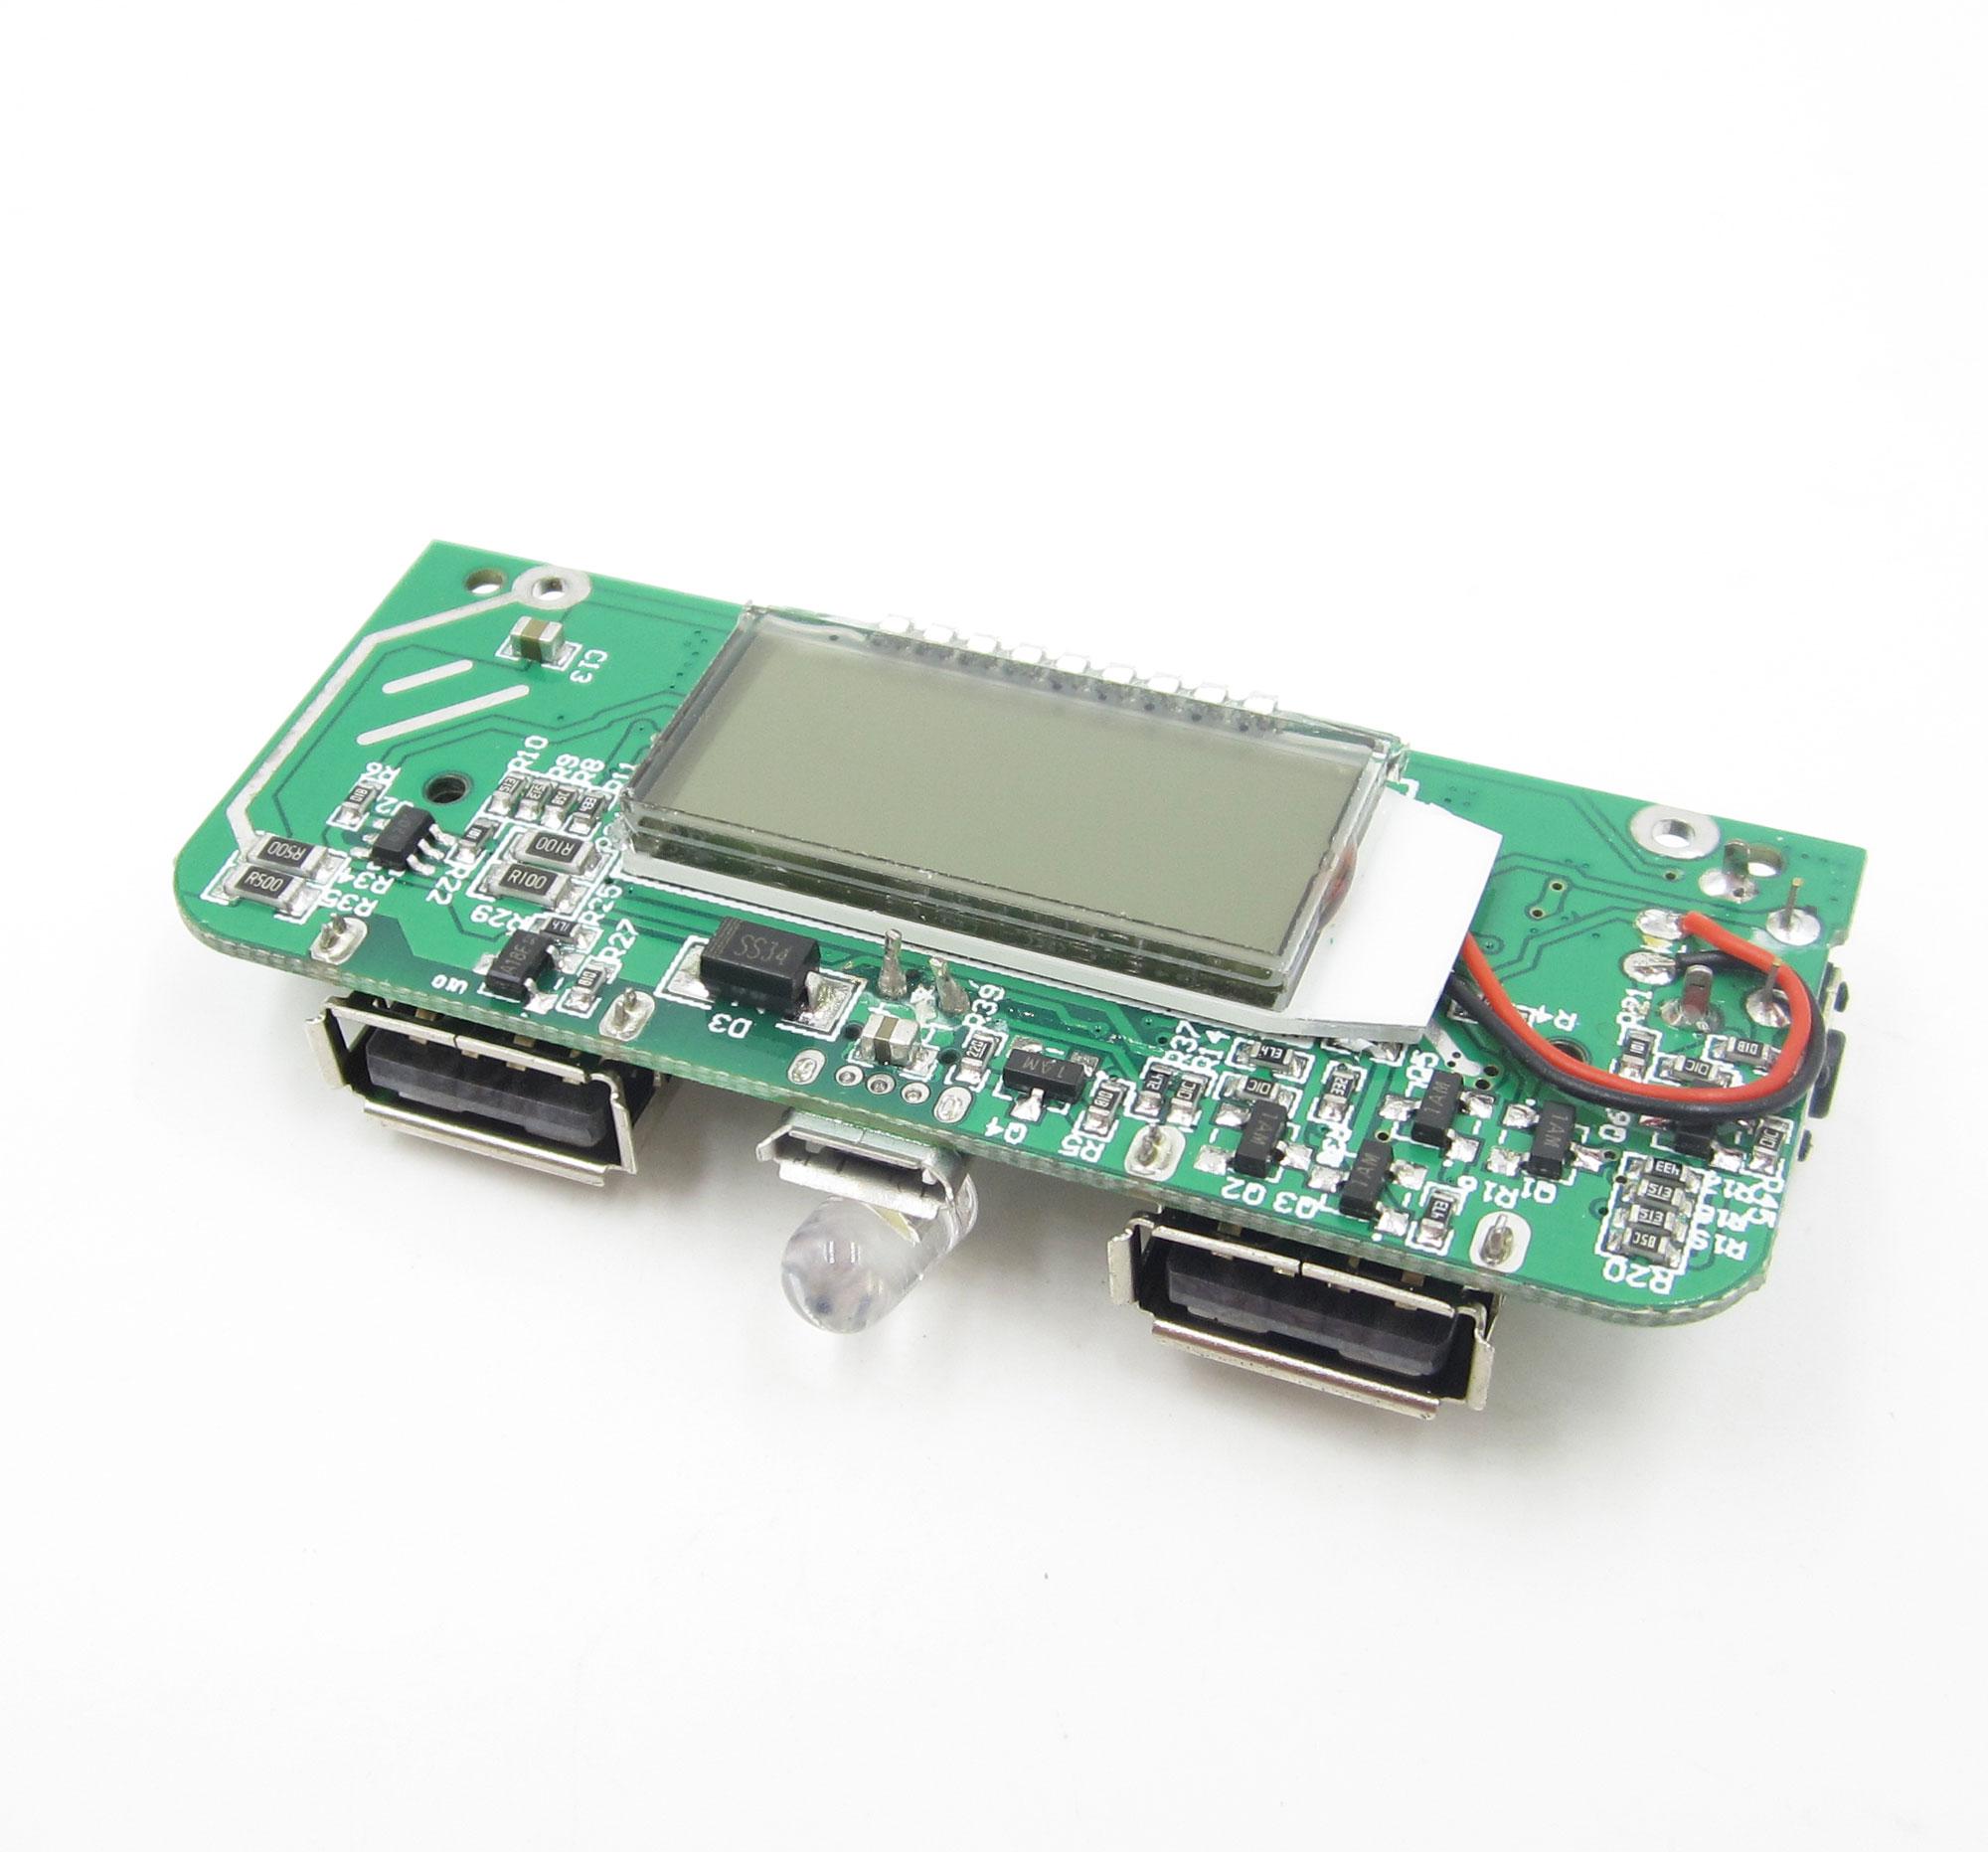 Para teléfono DIY Dual USB 5V 1A 2.1A banco de energía móvil 18650 cargador de batería PCB